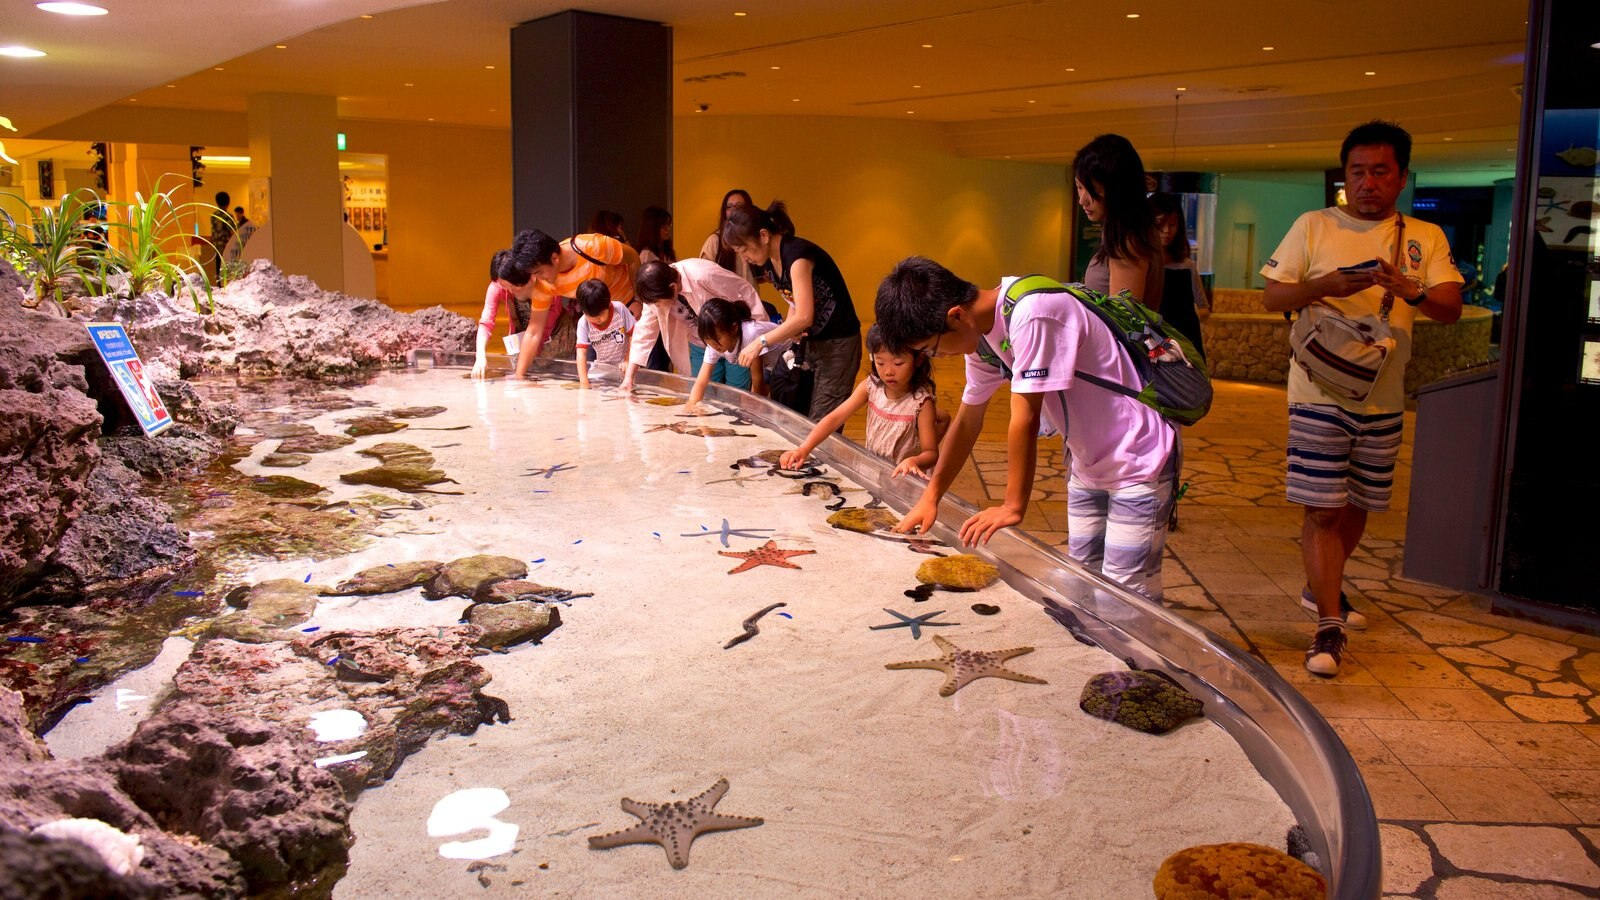 Okinawa Churaumi Aquarium which includes marine life and interior views